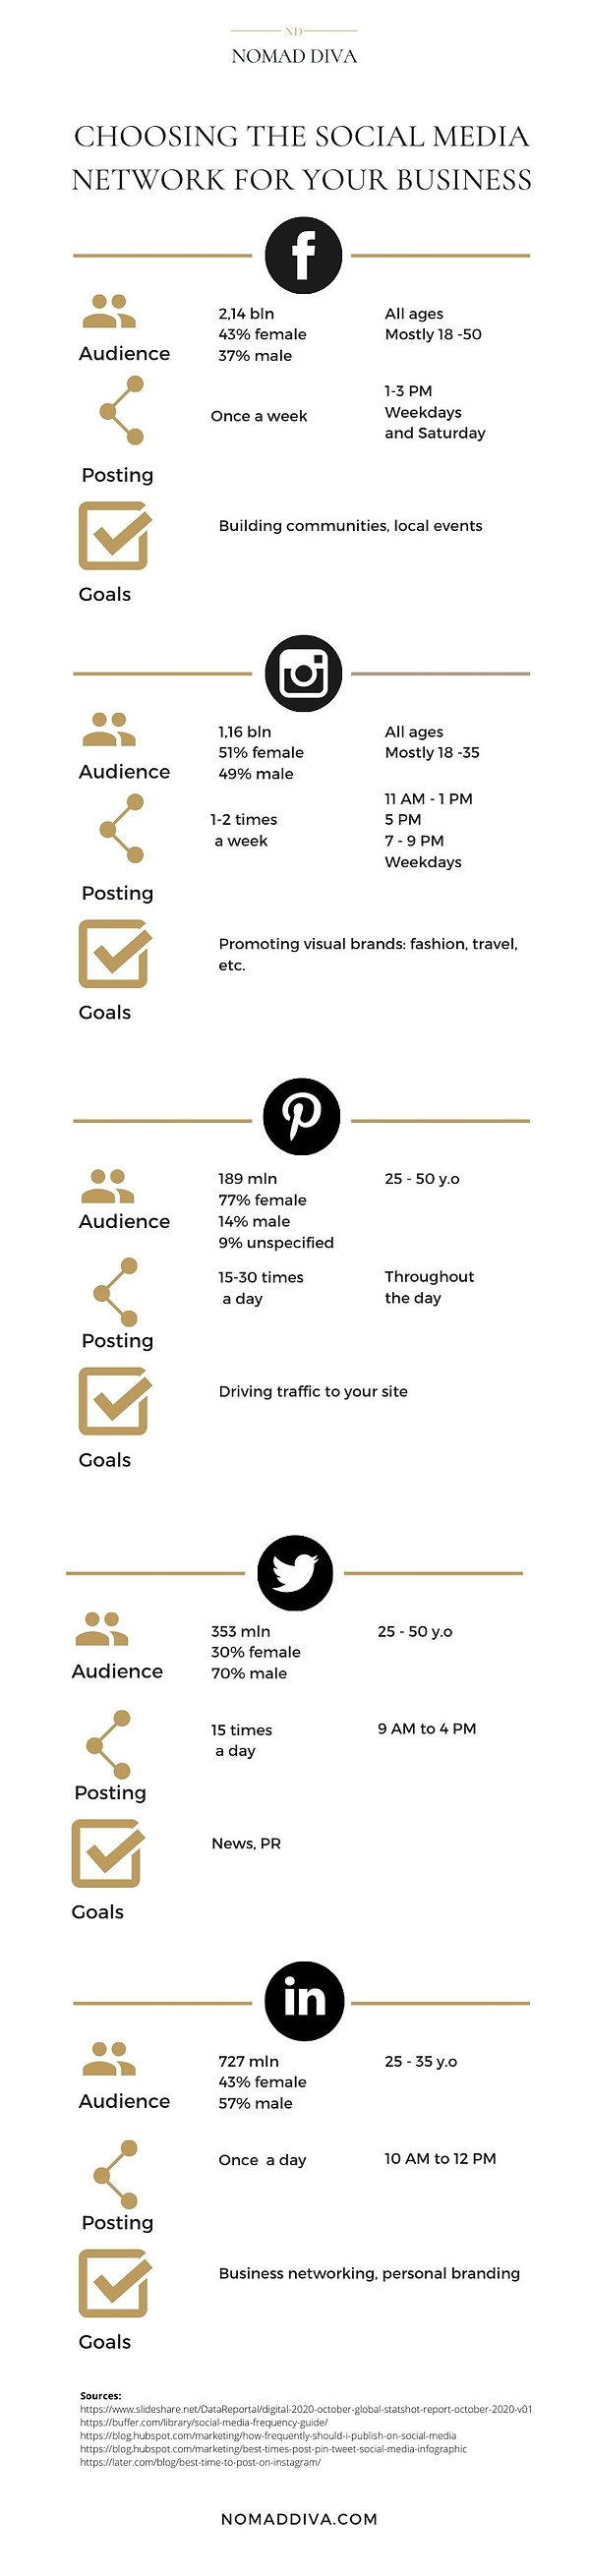 SMM-infographics-nomaddivacom.jpg